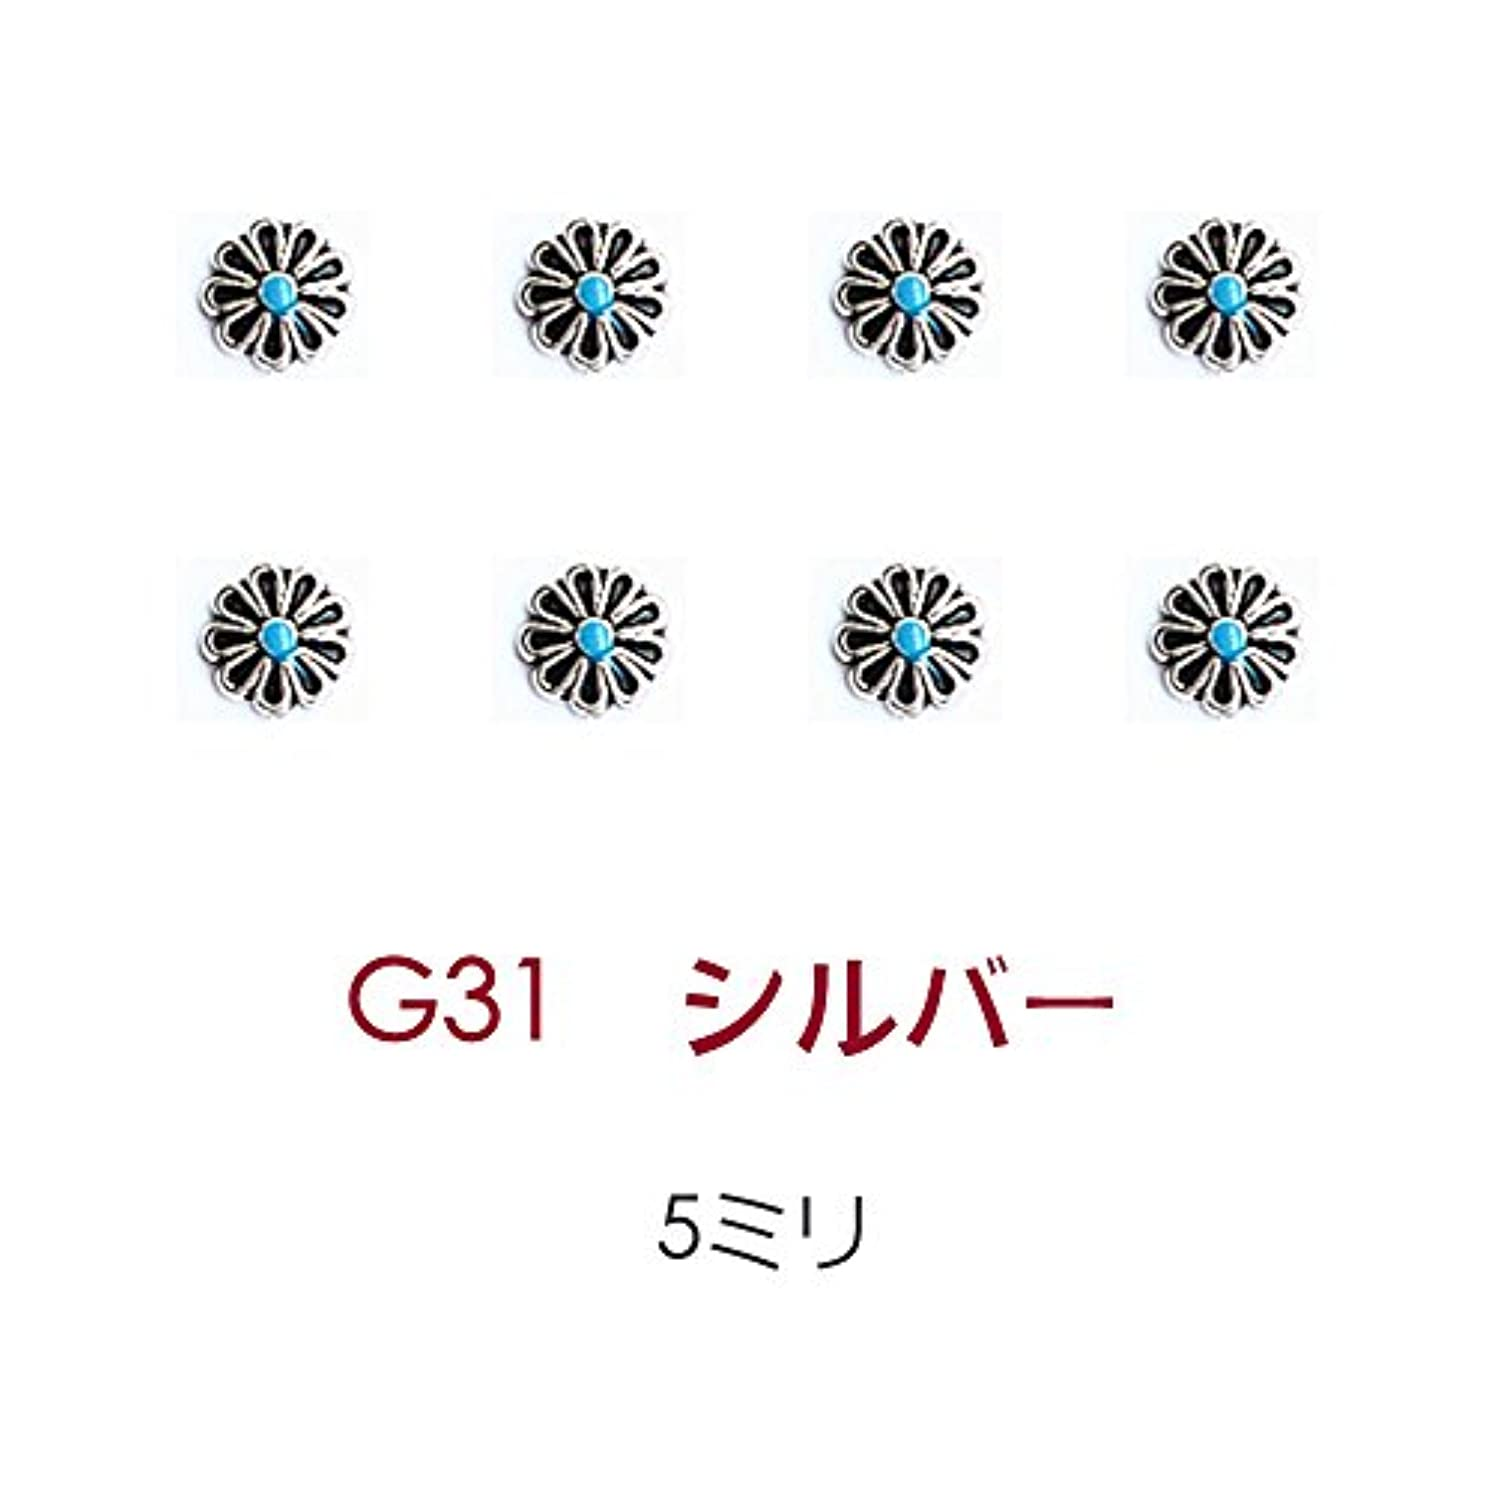 G31(5ミリ) シルバー 8個入り メタルパーツ コンチョ ターコイズ風 ゴールド シルバー ネイルパーツ スタッズ ネイル用品 GOLD SILVER アートパーツ アートパーツ デコ素材